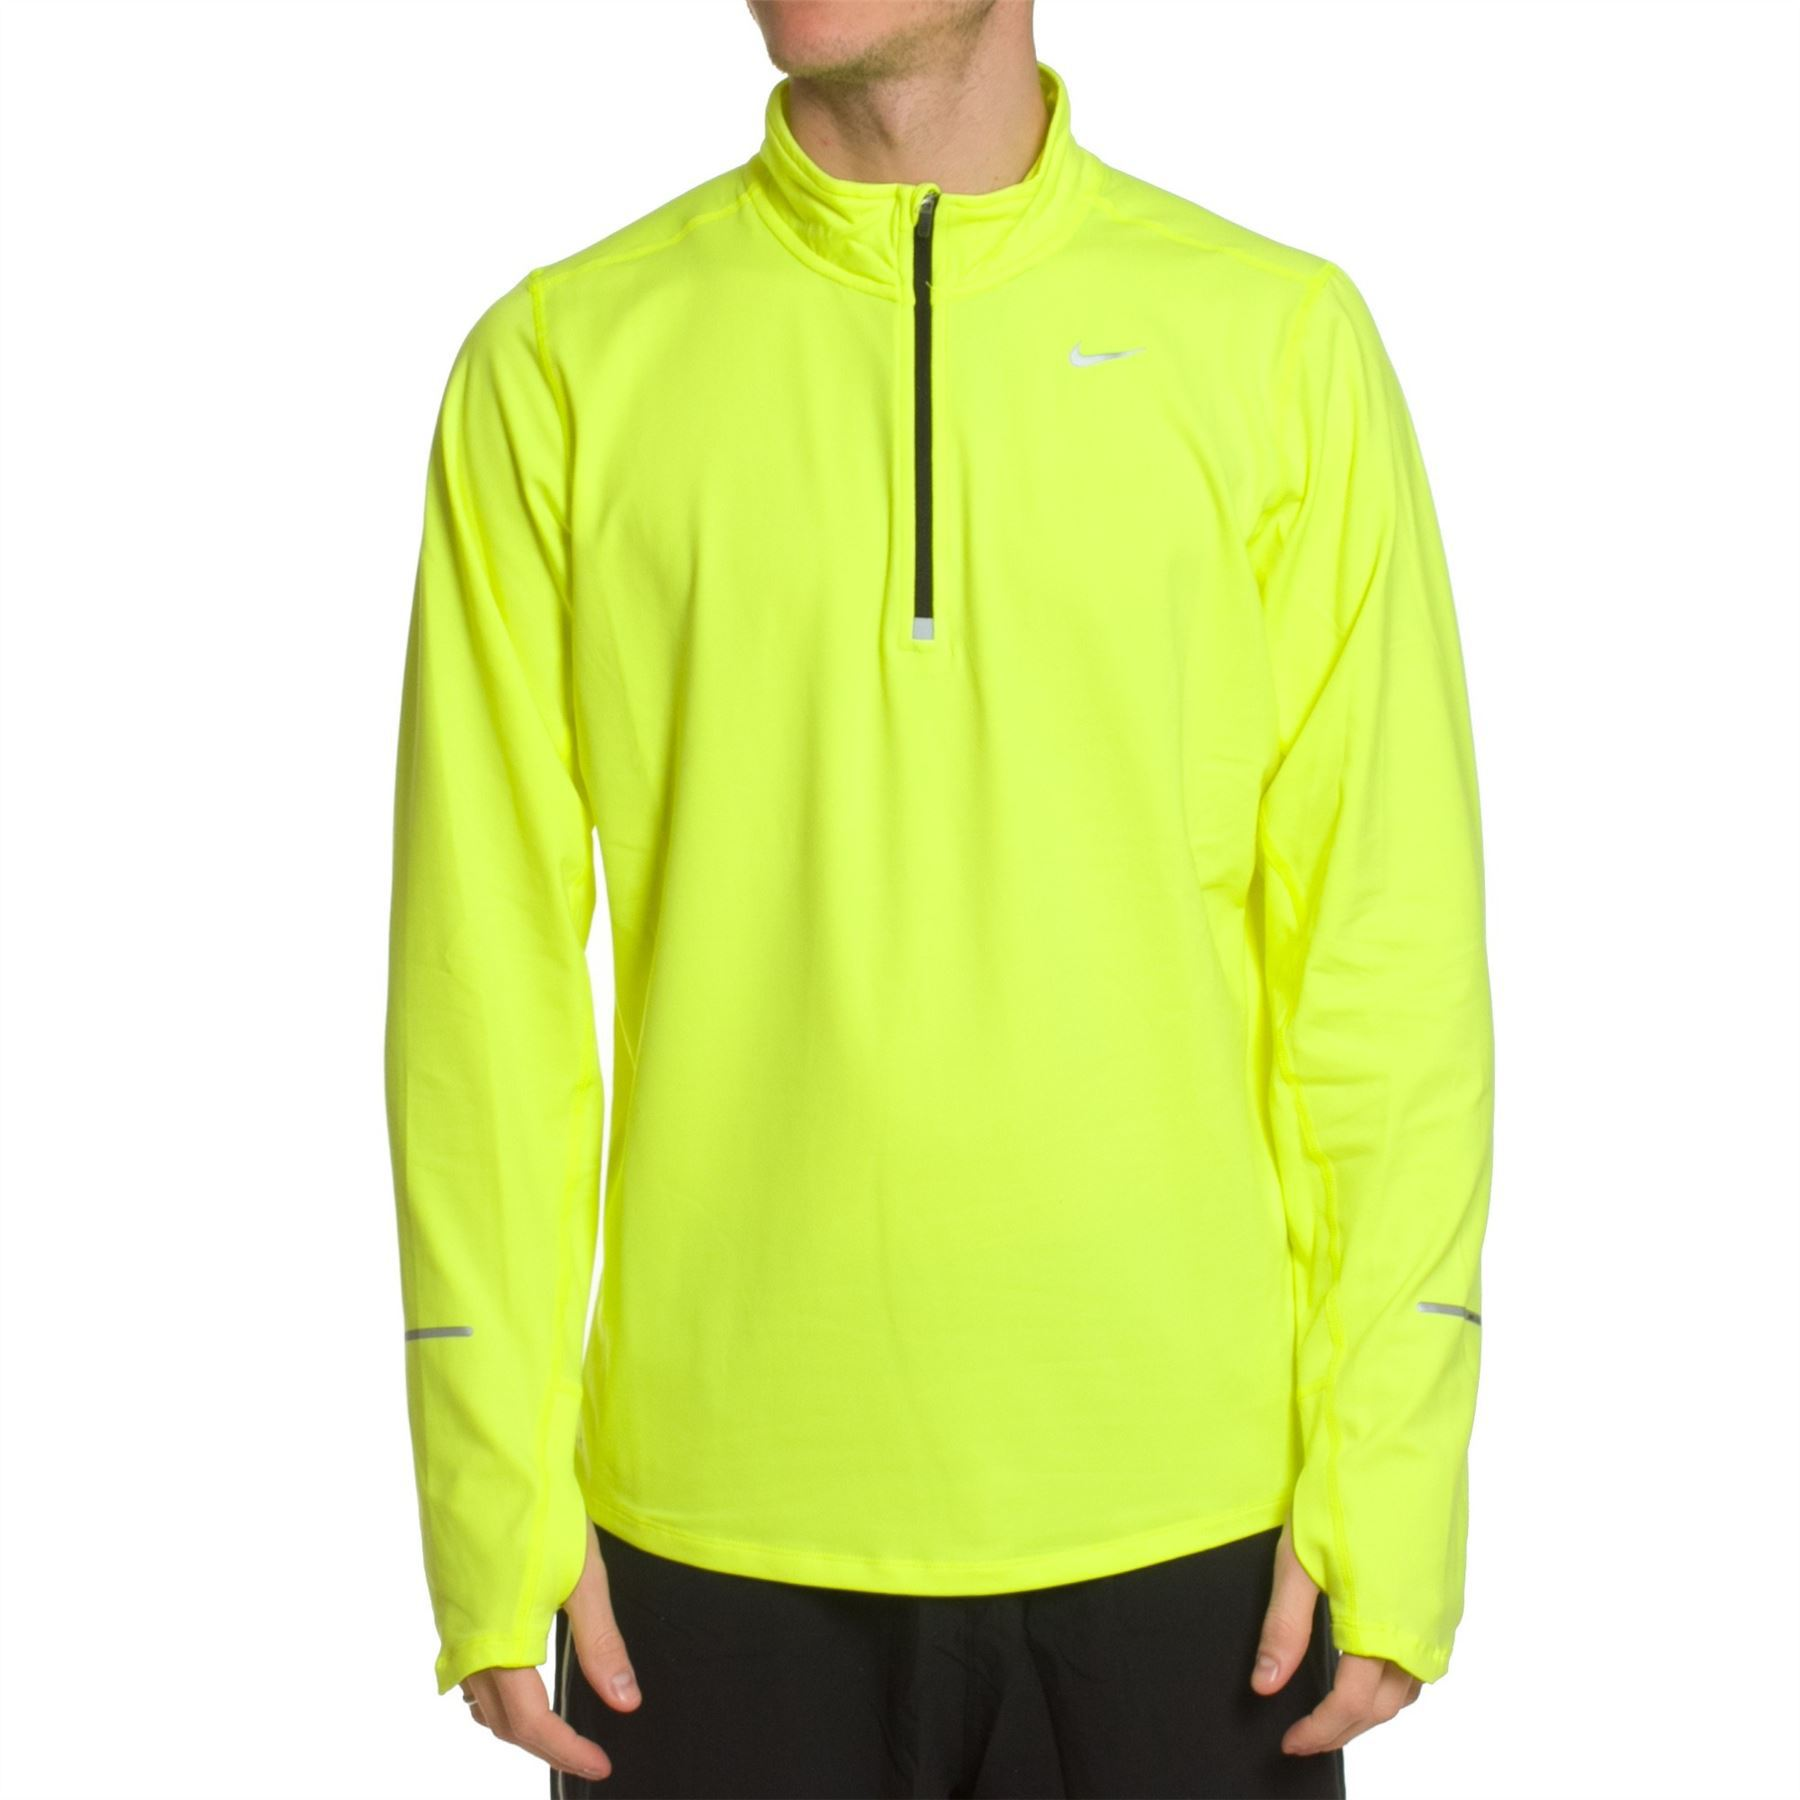 Мужская беговая футболка найк  Element 1/2 Zip LS (504606 703) фото